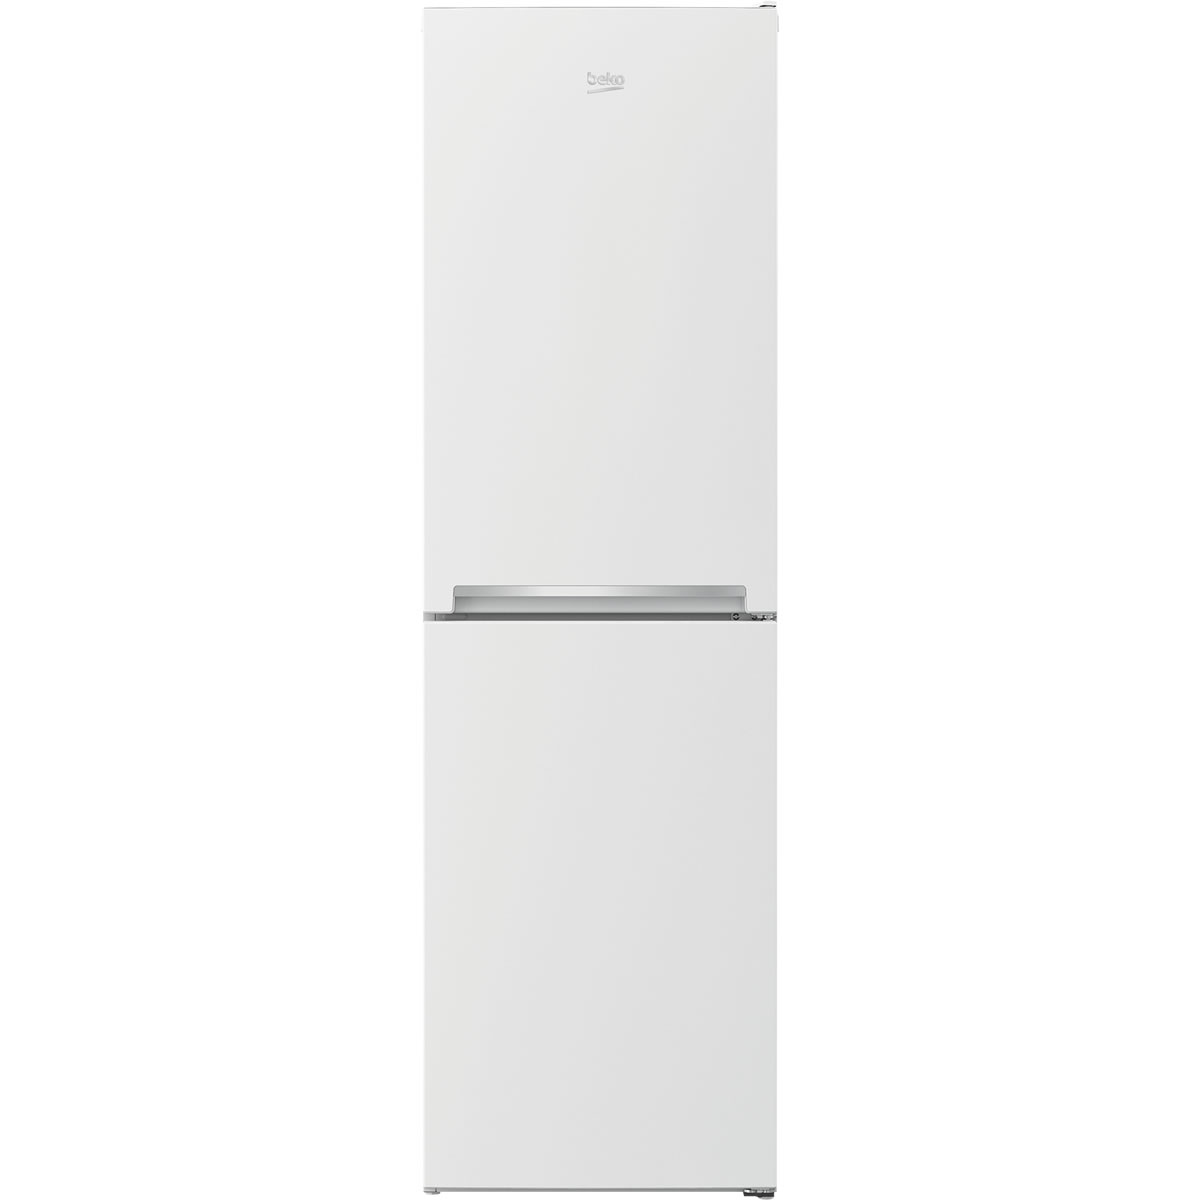 CFG3582W 263litre Fridge Freezer Frost Free Class A+ White